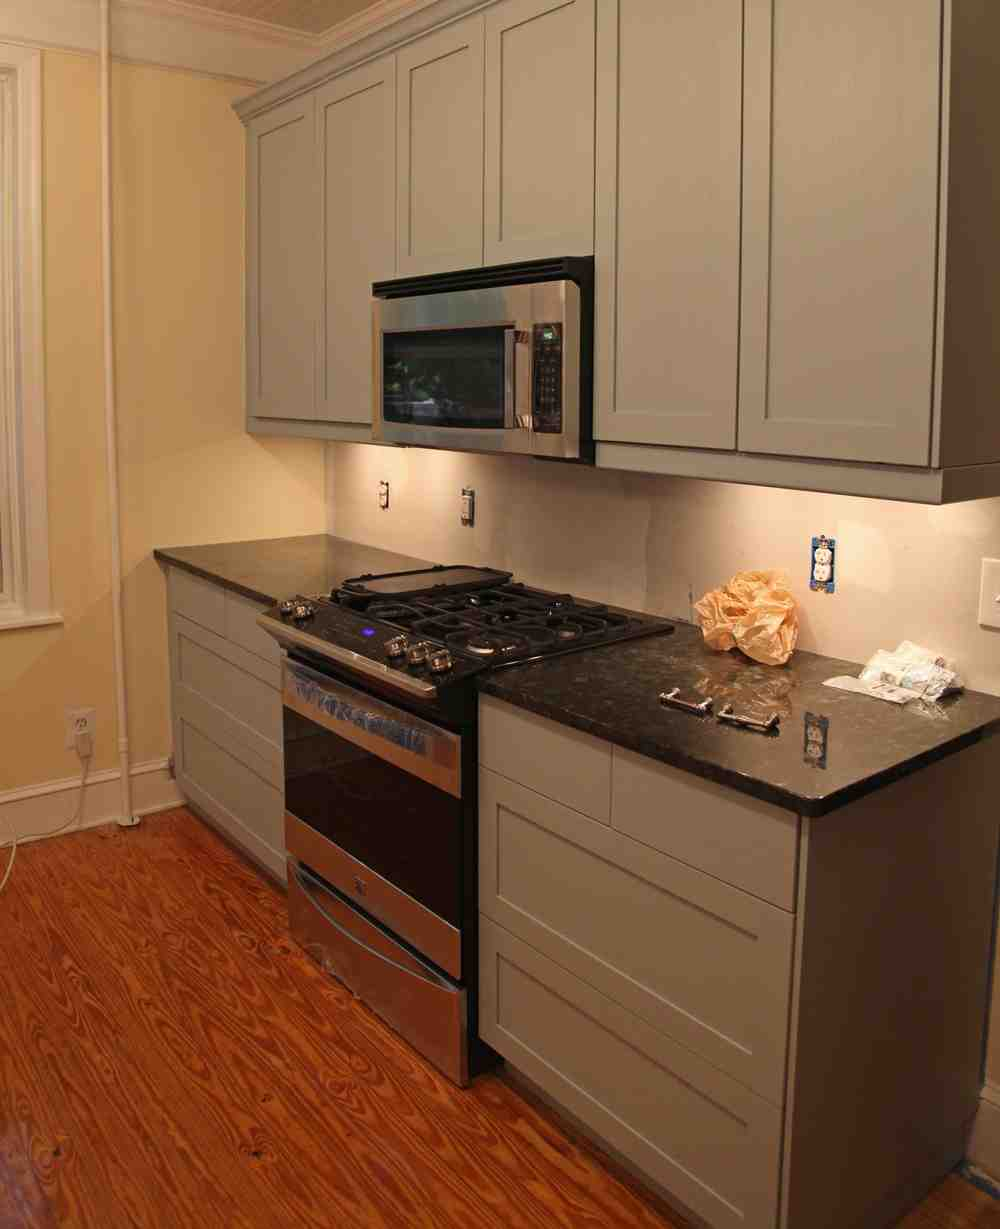 Kitchen Cabinets Inside: Microwave Inside Cabinet